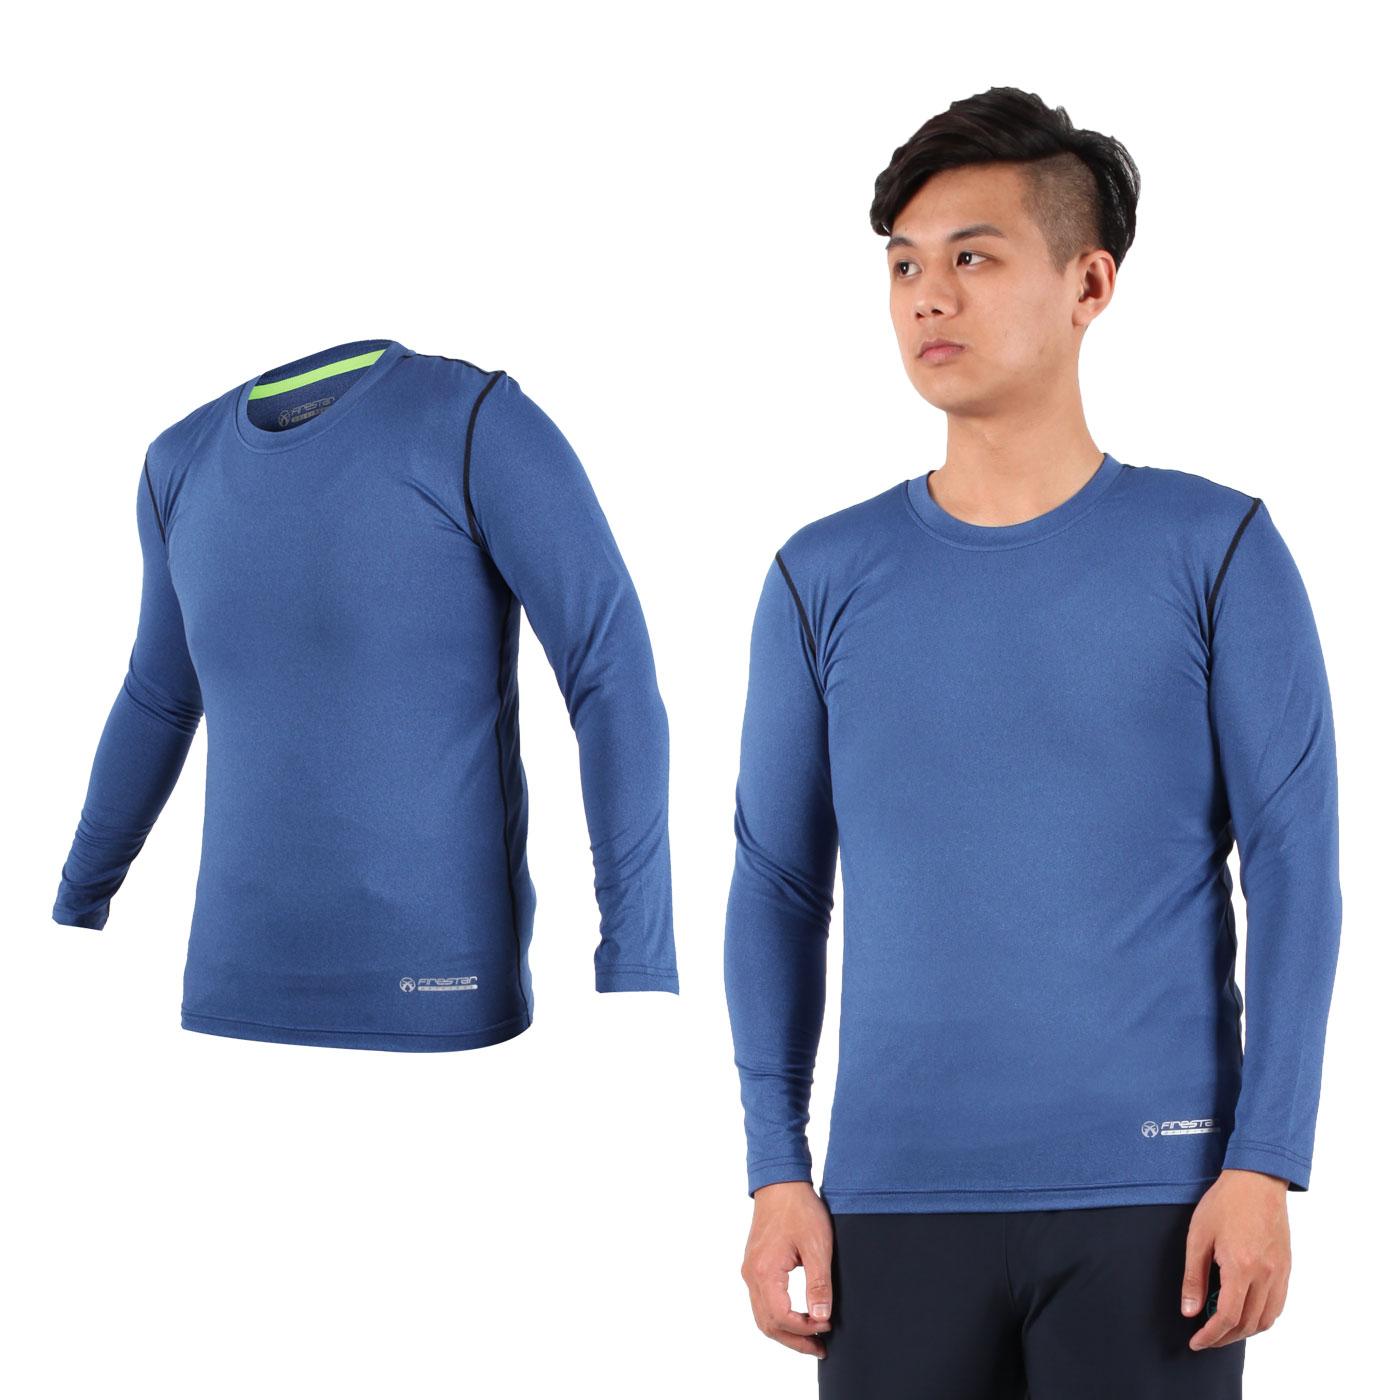 FIRESTAR 男款機能緊身長袖上衣 N7908-17 - 深藍